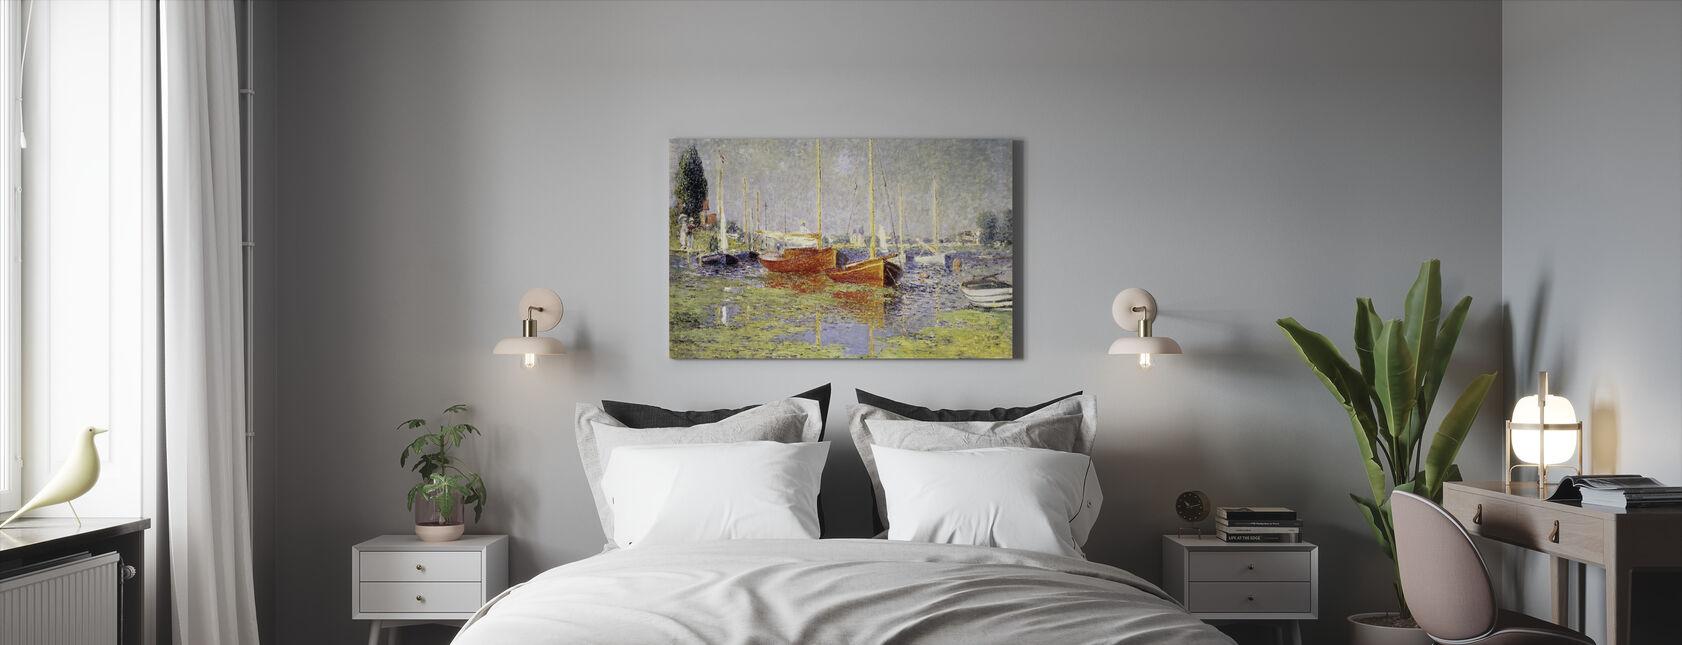 Argenteuil - Claude Monet - Canvas print - Bedroom